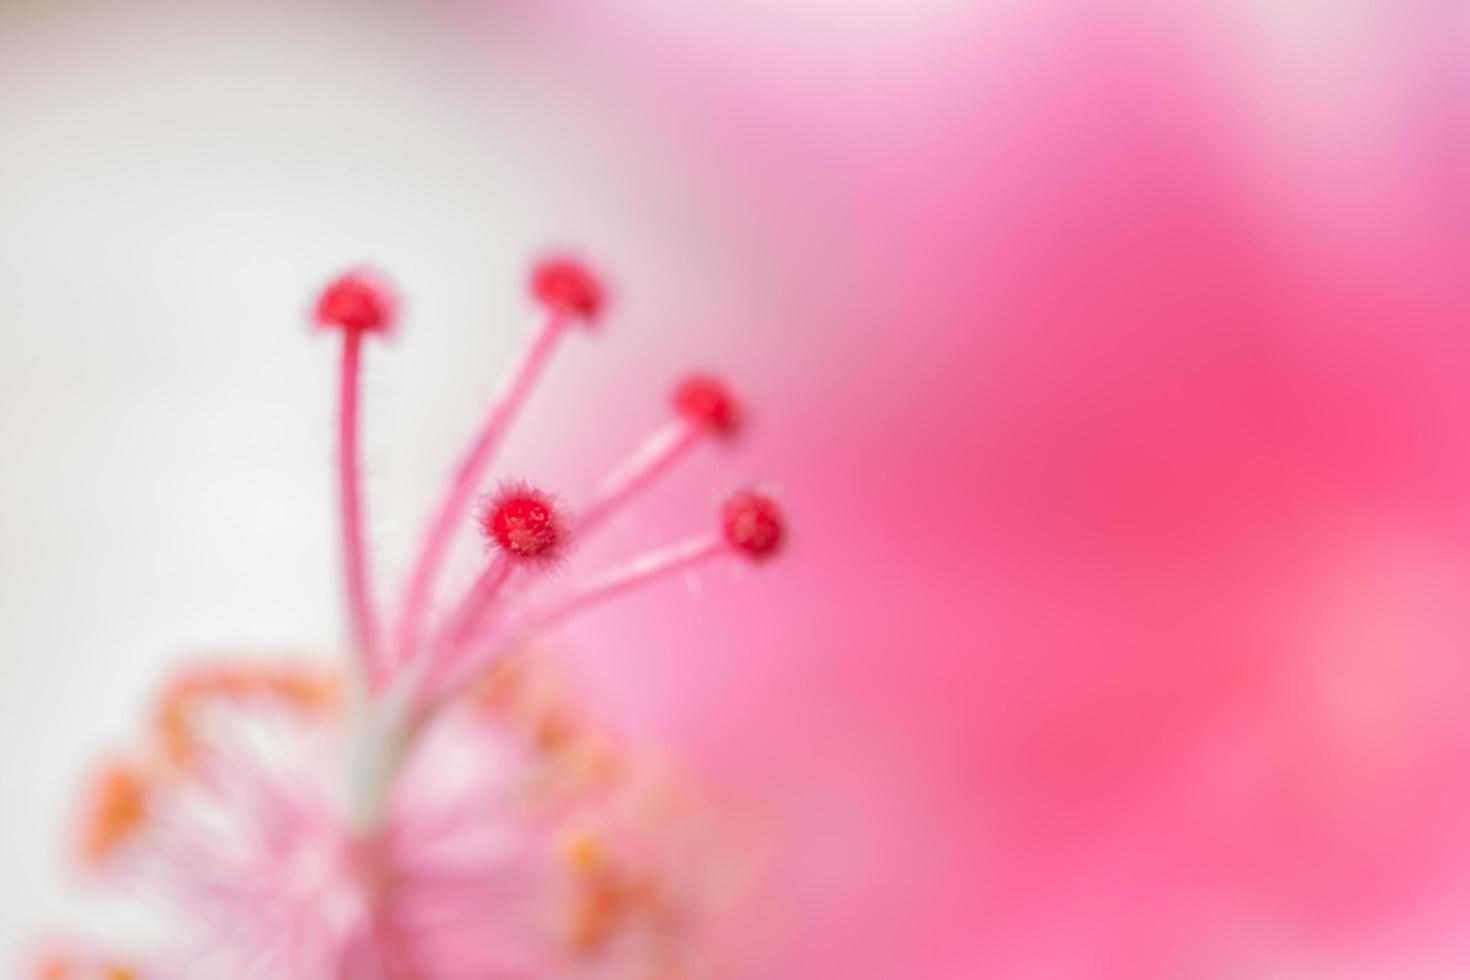 roze stuifmeel close-up, onscherpe achtergrond foto